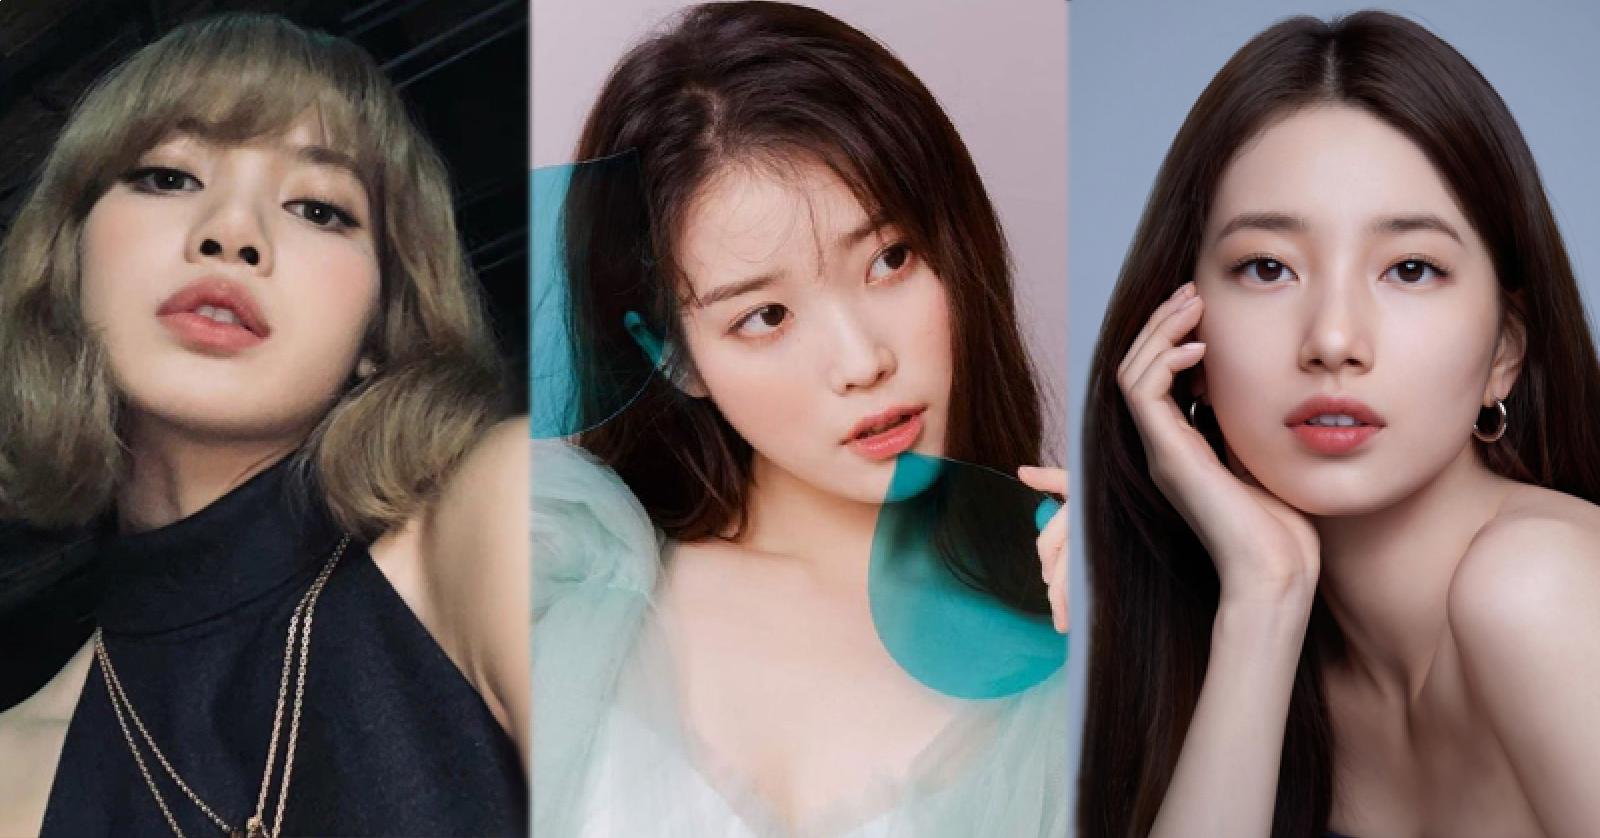 7 Richest Female K-Pop Idols According to Korean Media Outlet